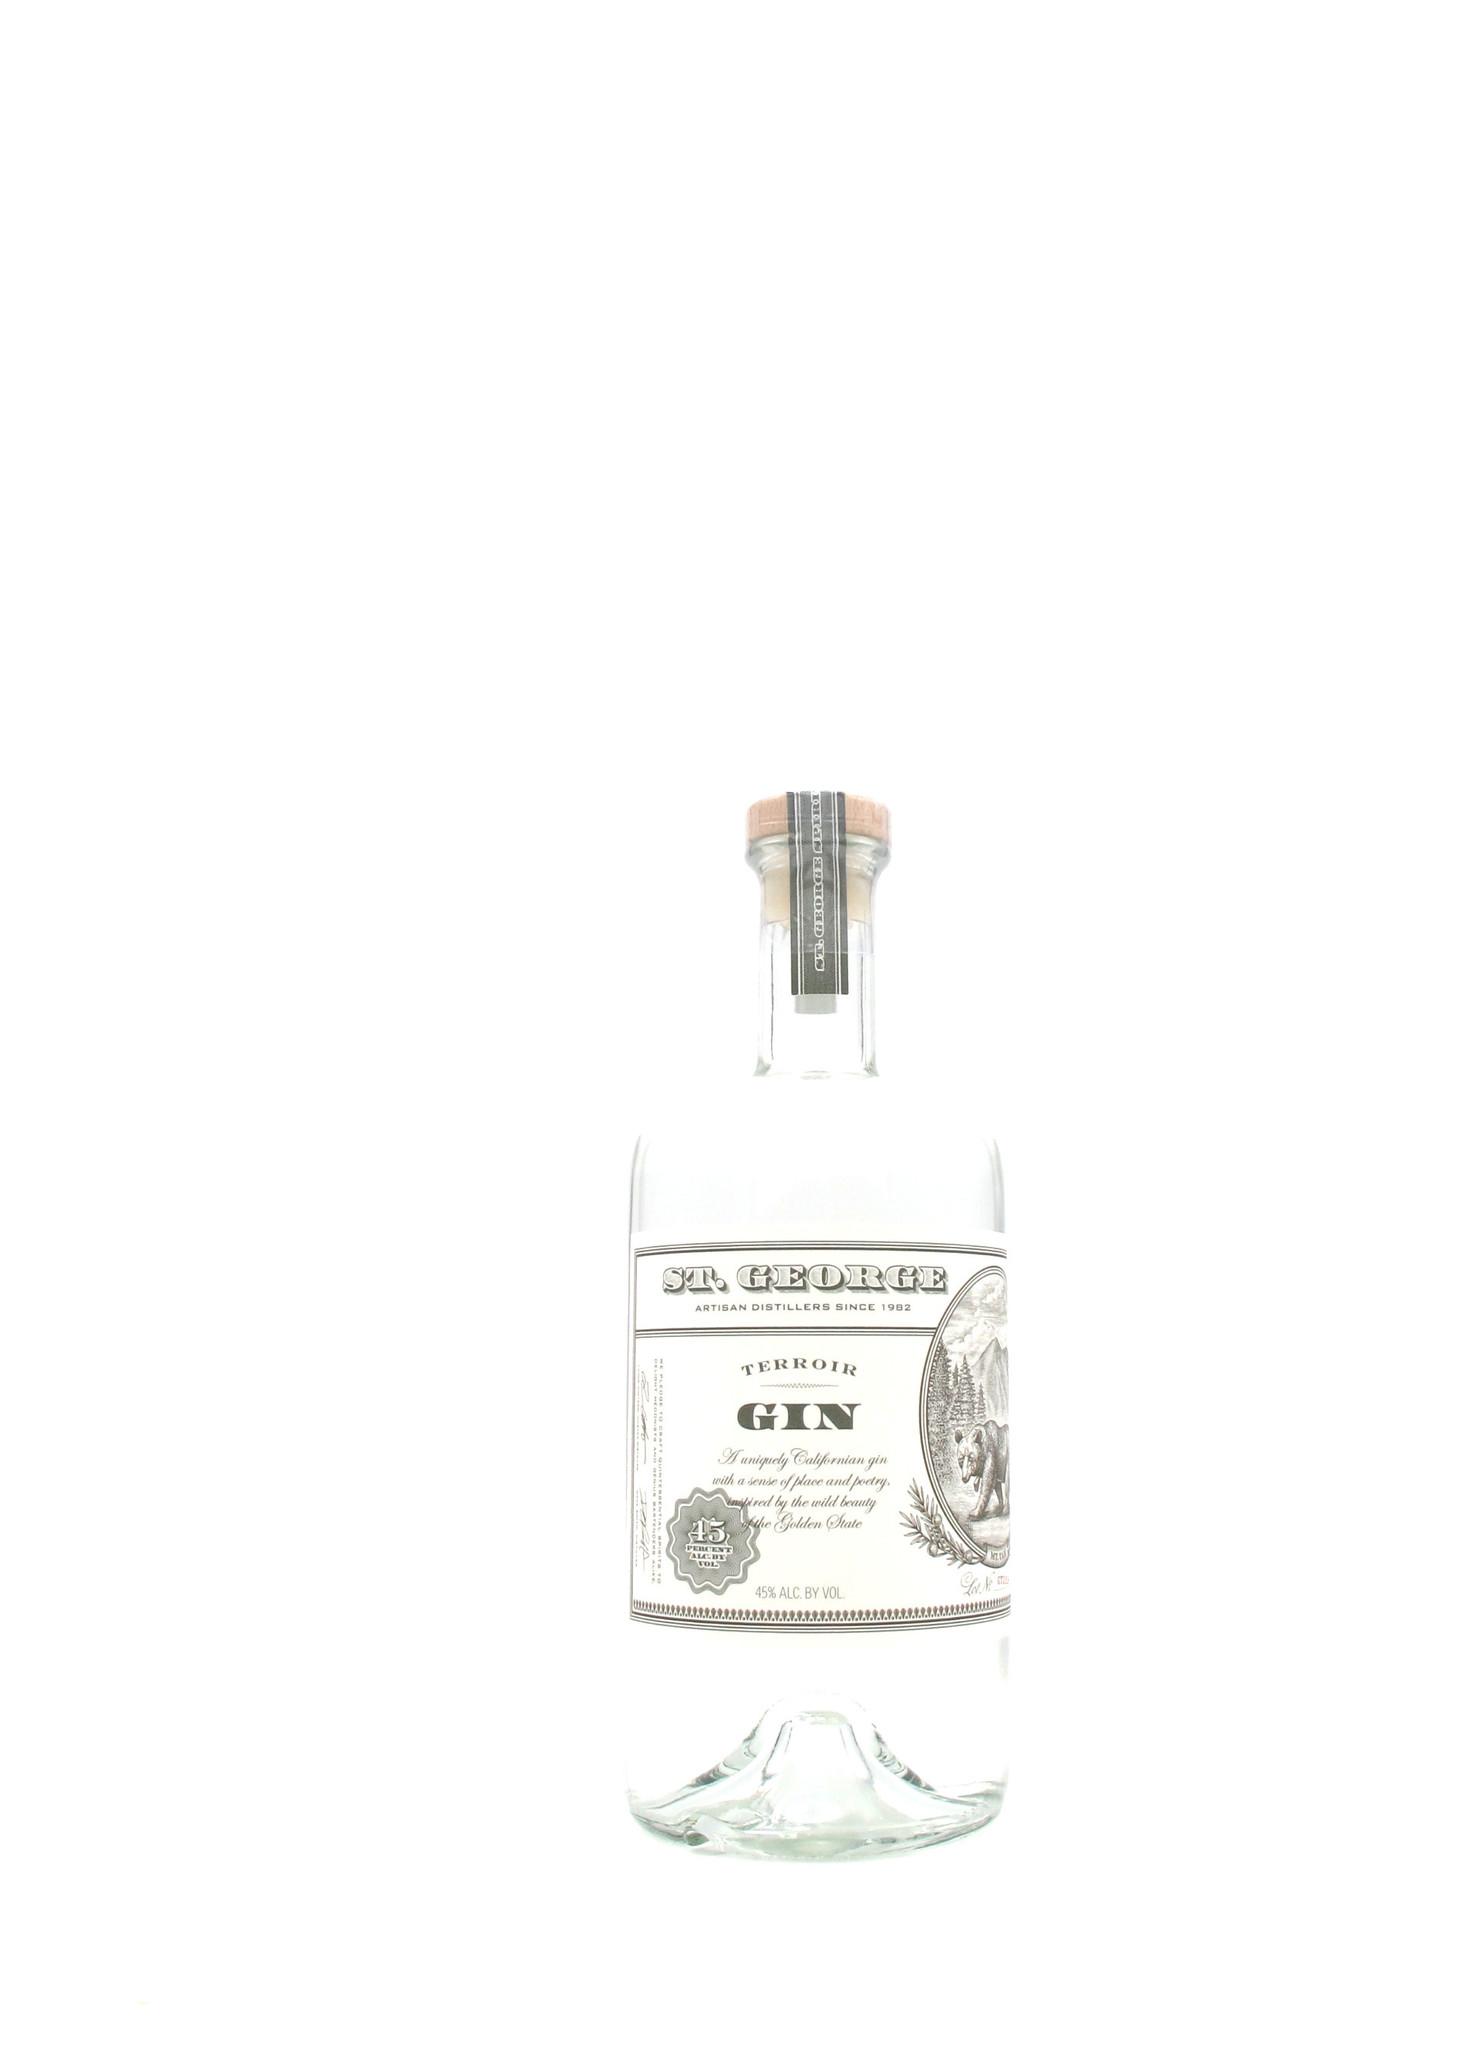 St. George Spirits St. George Terroir Gin 750mL